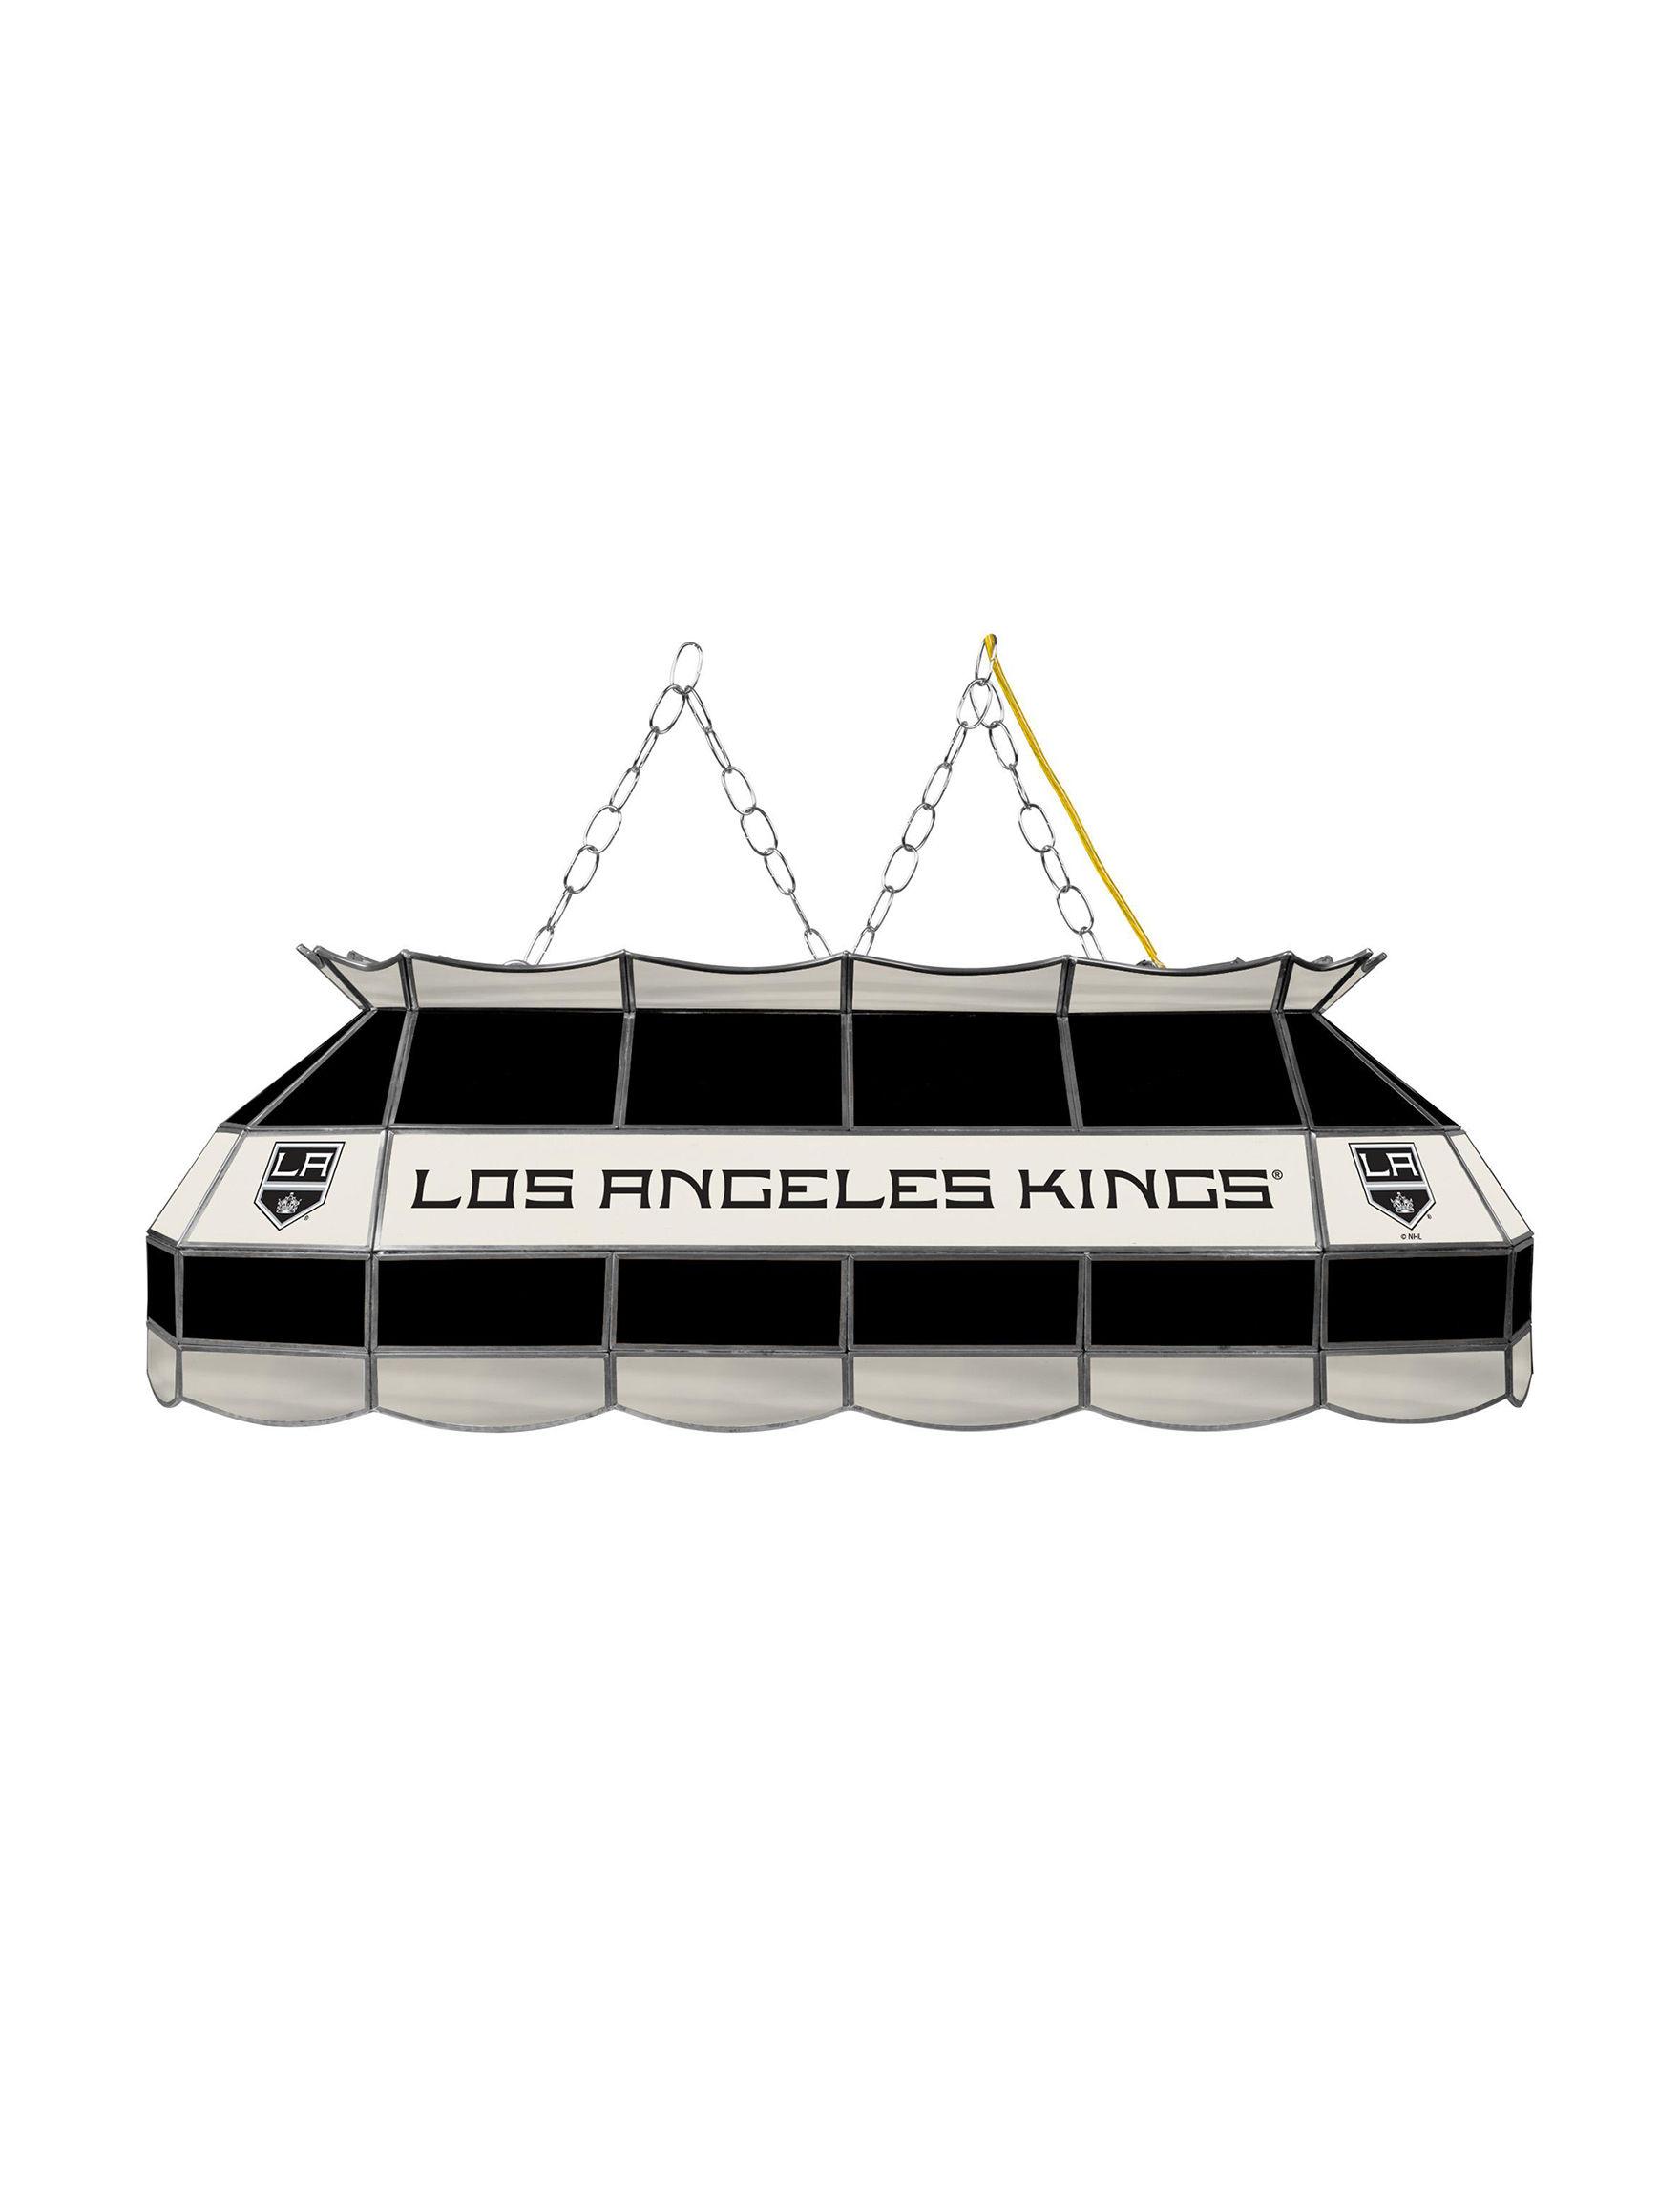 NHL Black / Silver / White Chandeliers Lights & Lanterns Lighting & Lamps